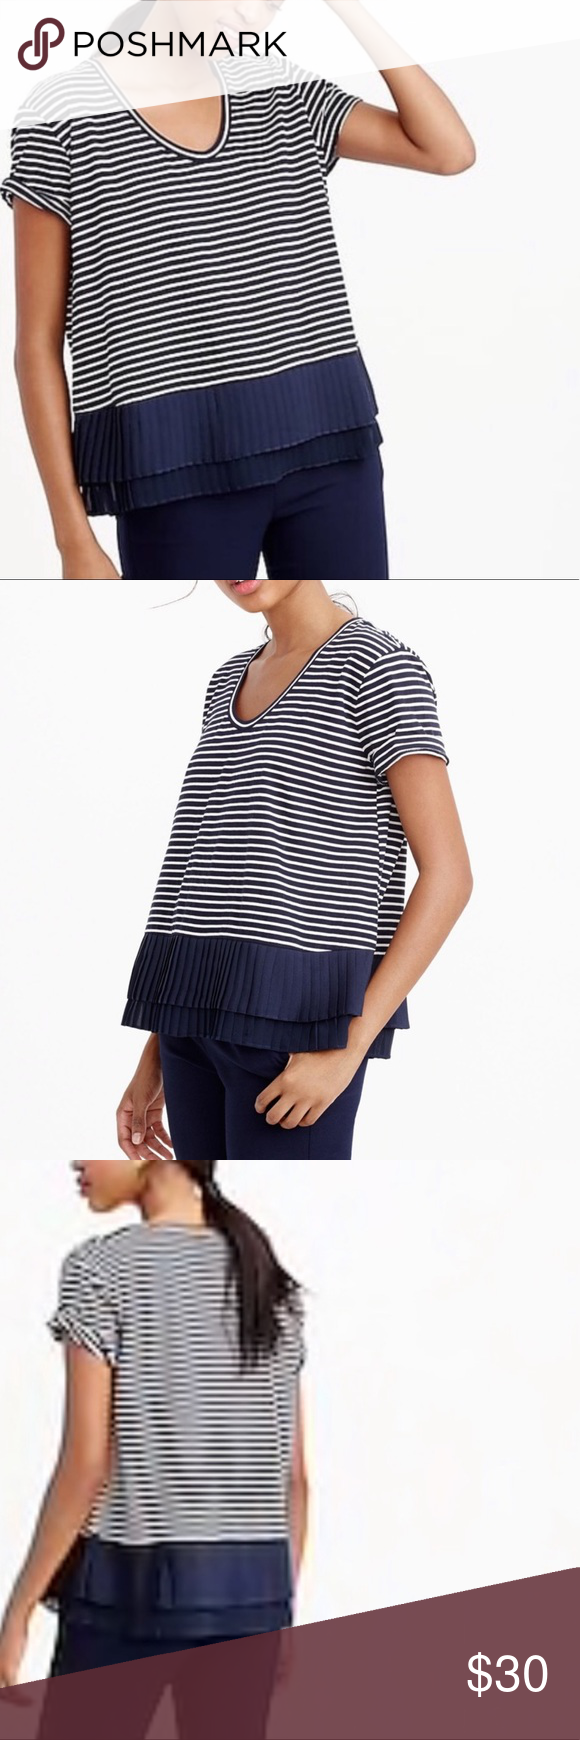 "756b1904 J. Crew Blue Striped Pleated Chiffon Hem T-shirt 25.5"" length 22.5"" armpit  to armpit. Blue and white striped. Pleated chiffon hem. Nautical preppy  feel."